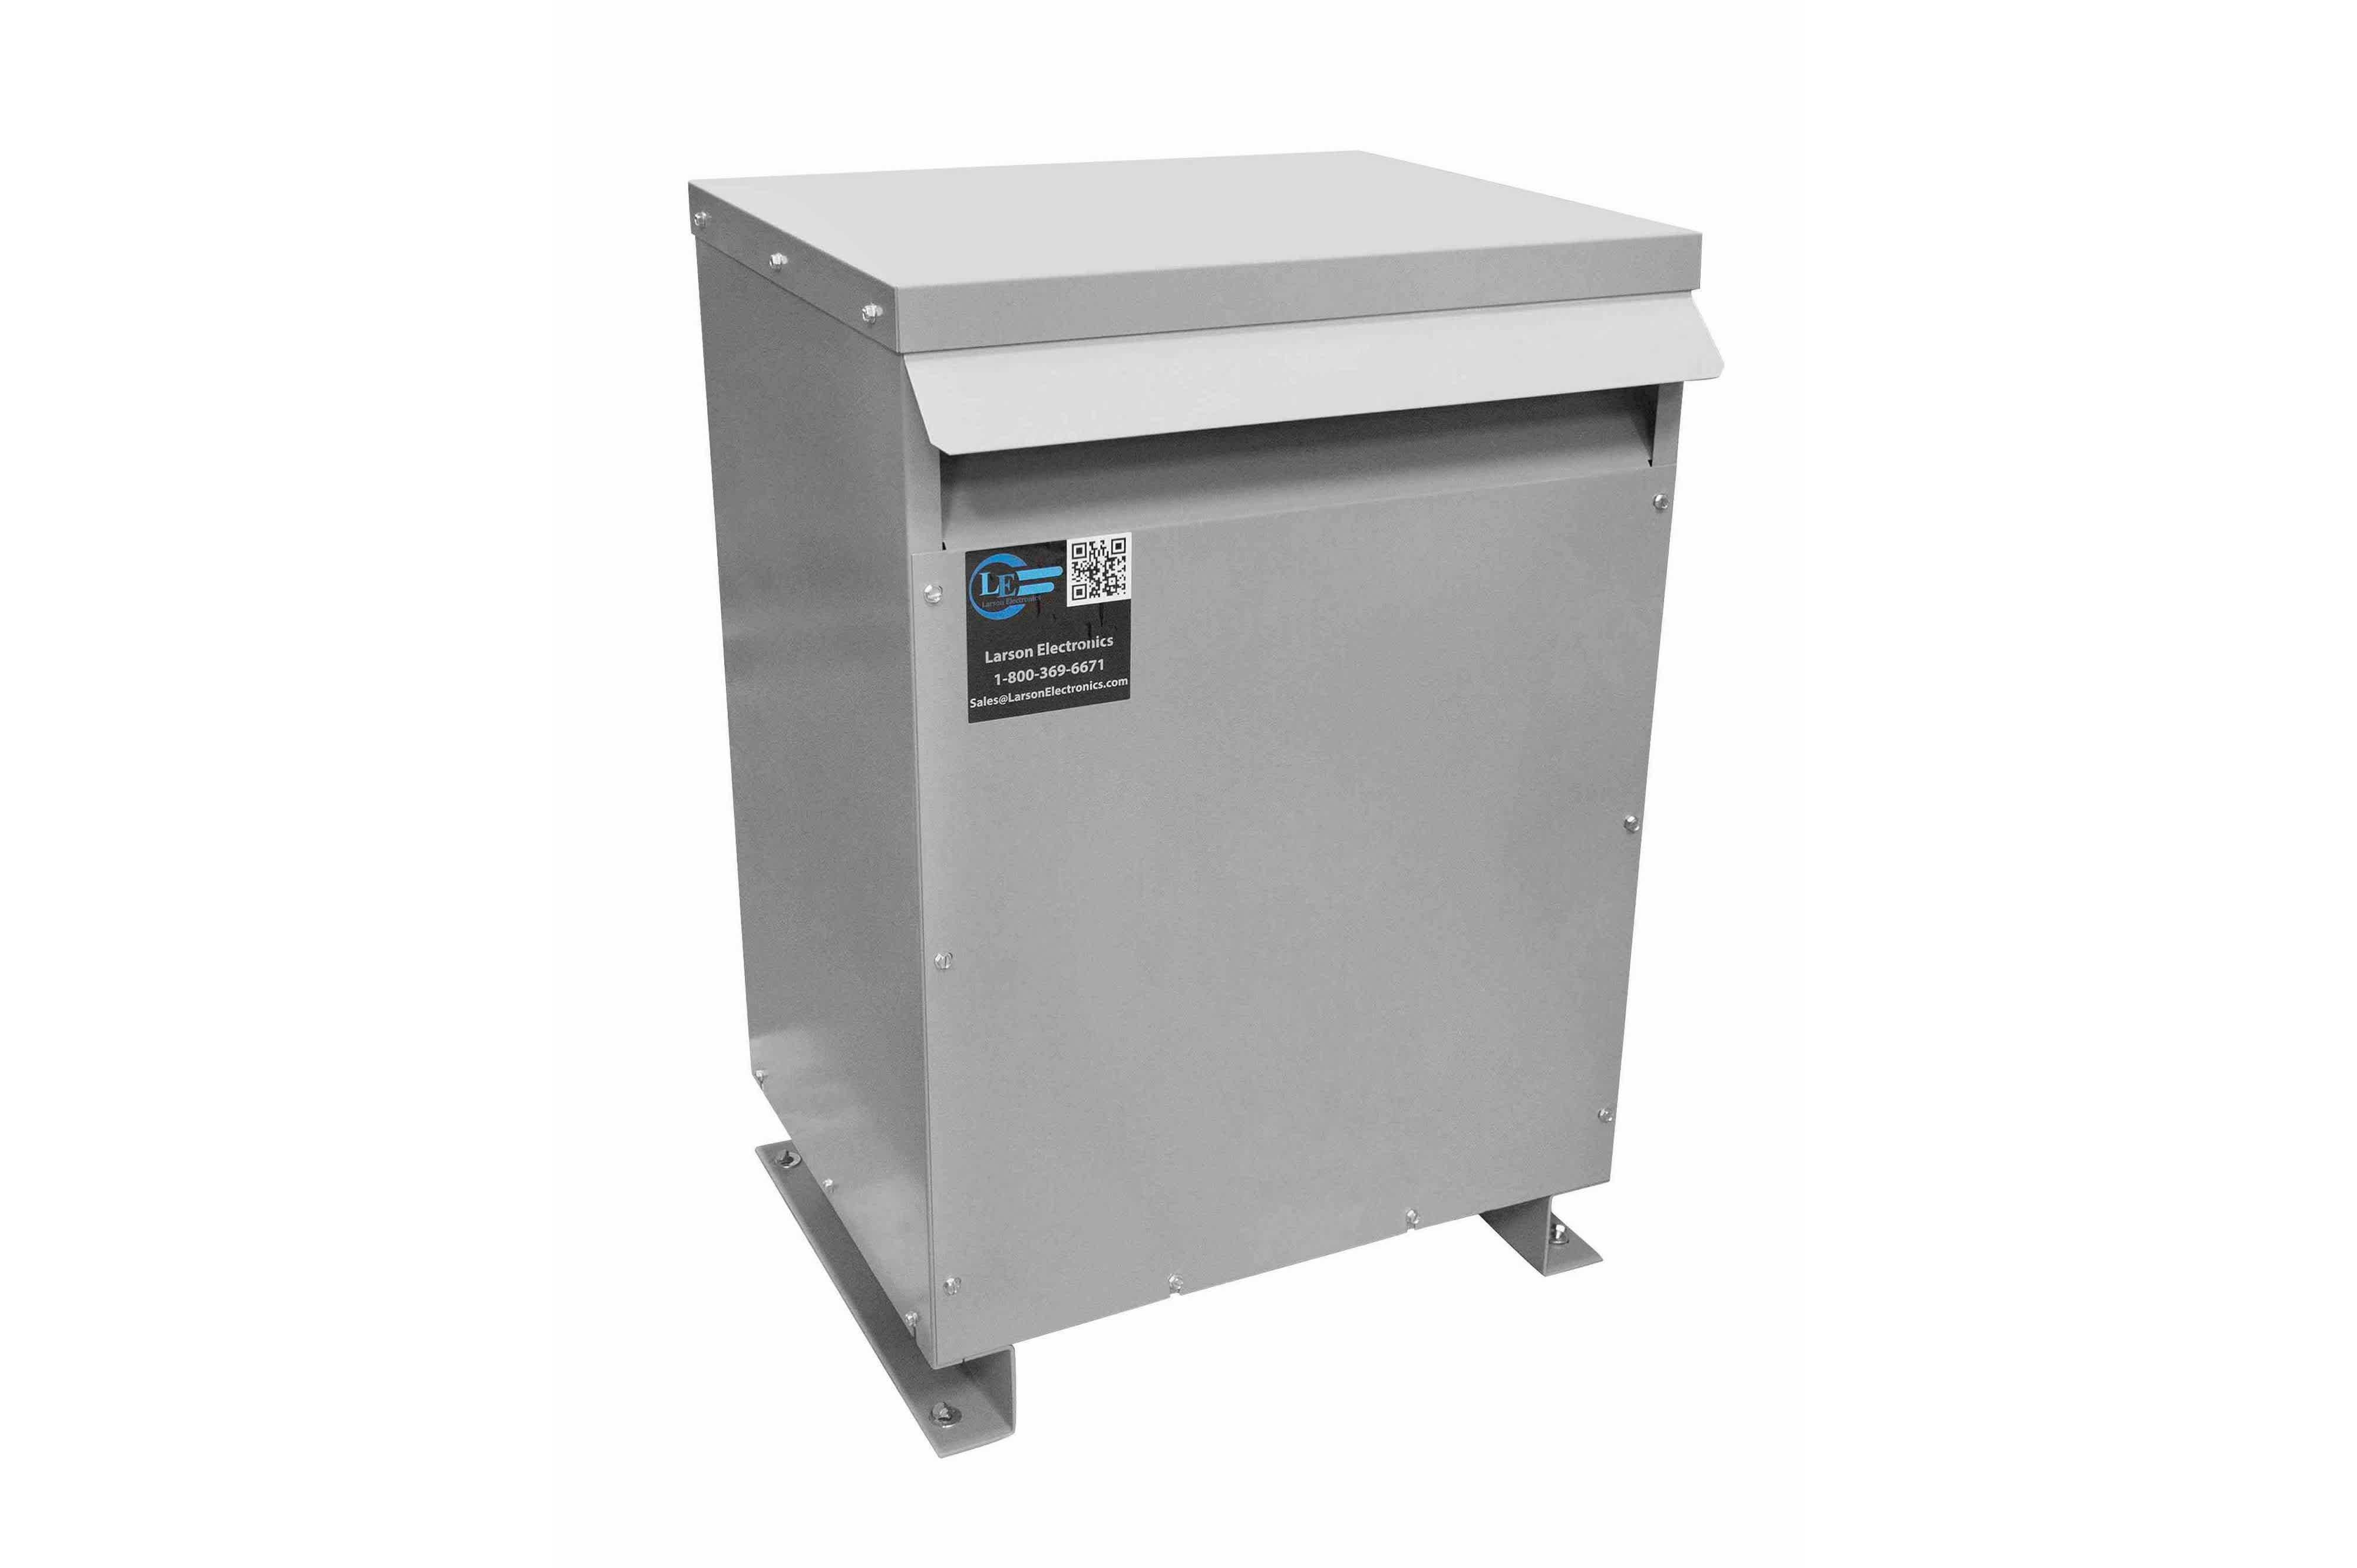 35 kVA 3PH Isolation Transformer, 415V Wye Primary, 208Y/120 Wye-N Secondary, N3R, Ventilated, 60 Hz